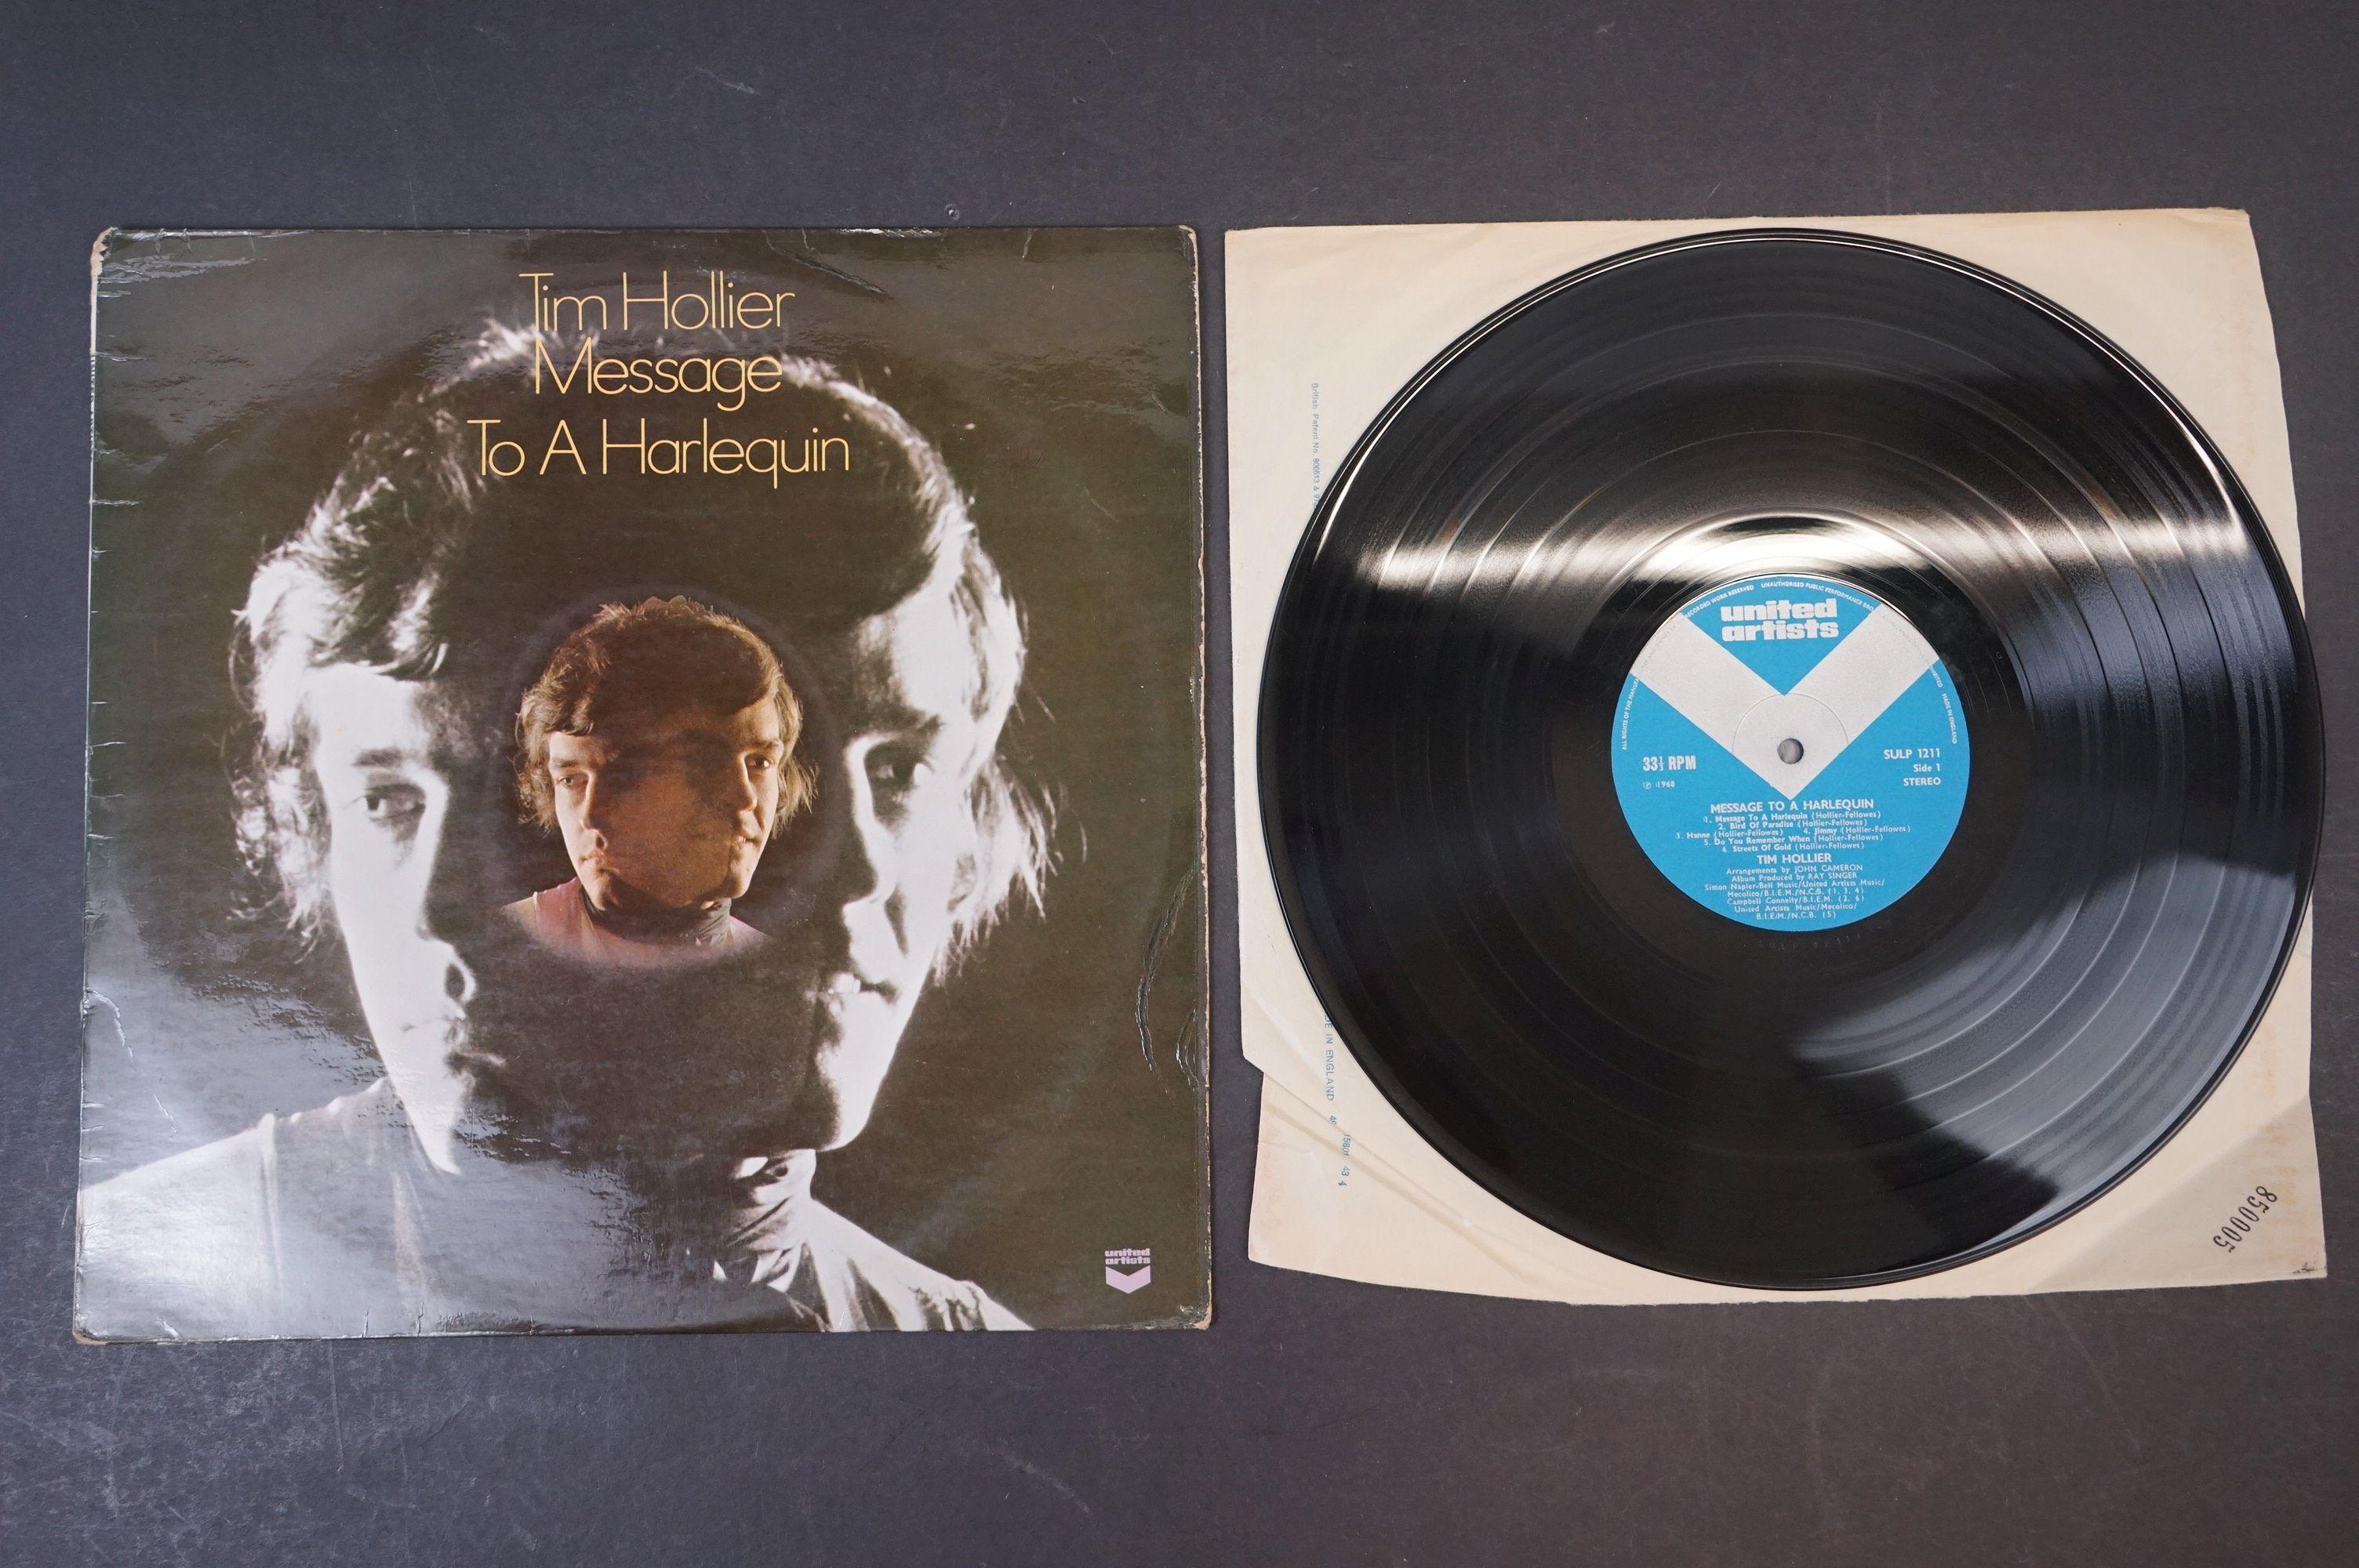 Vinyl - Acid Folk / Psych - Tim Hollier, Three scarce original pressing albums to include ?? - Image 2 of 7